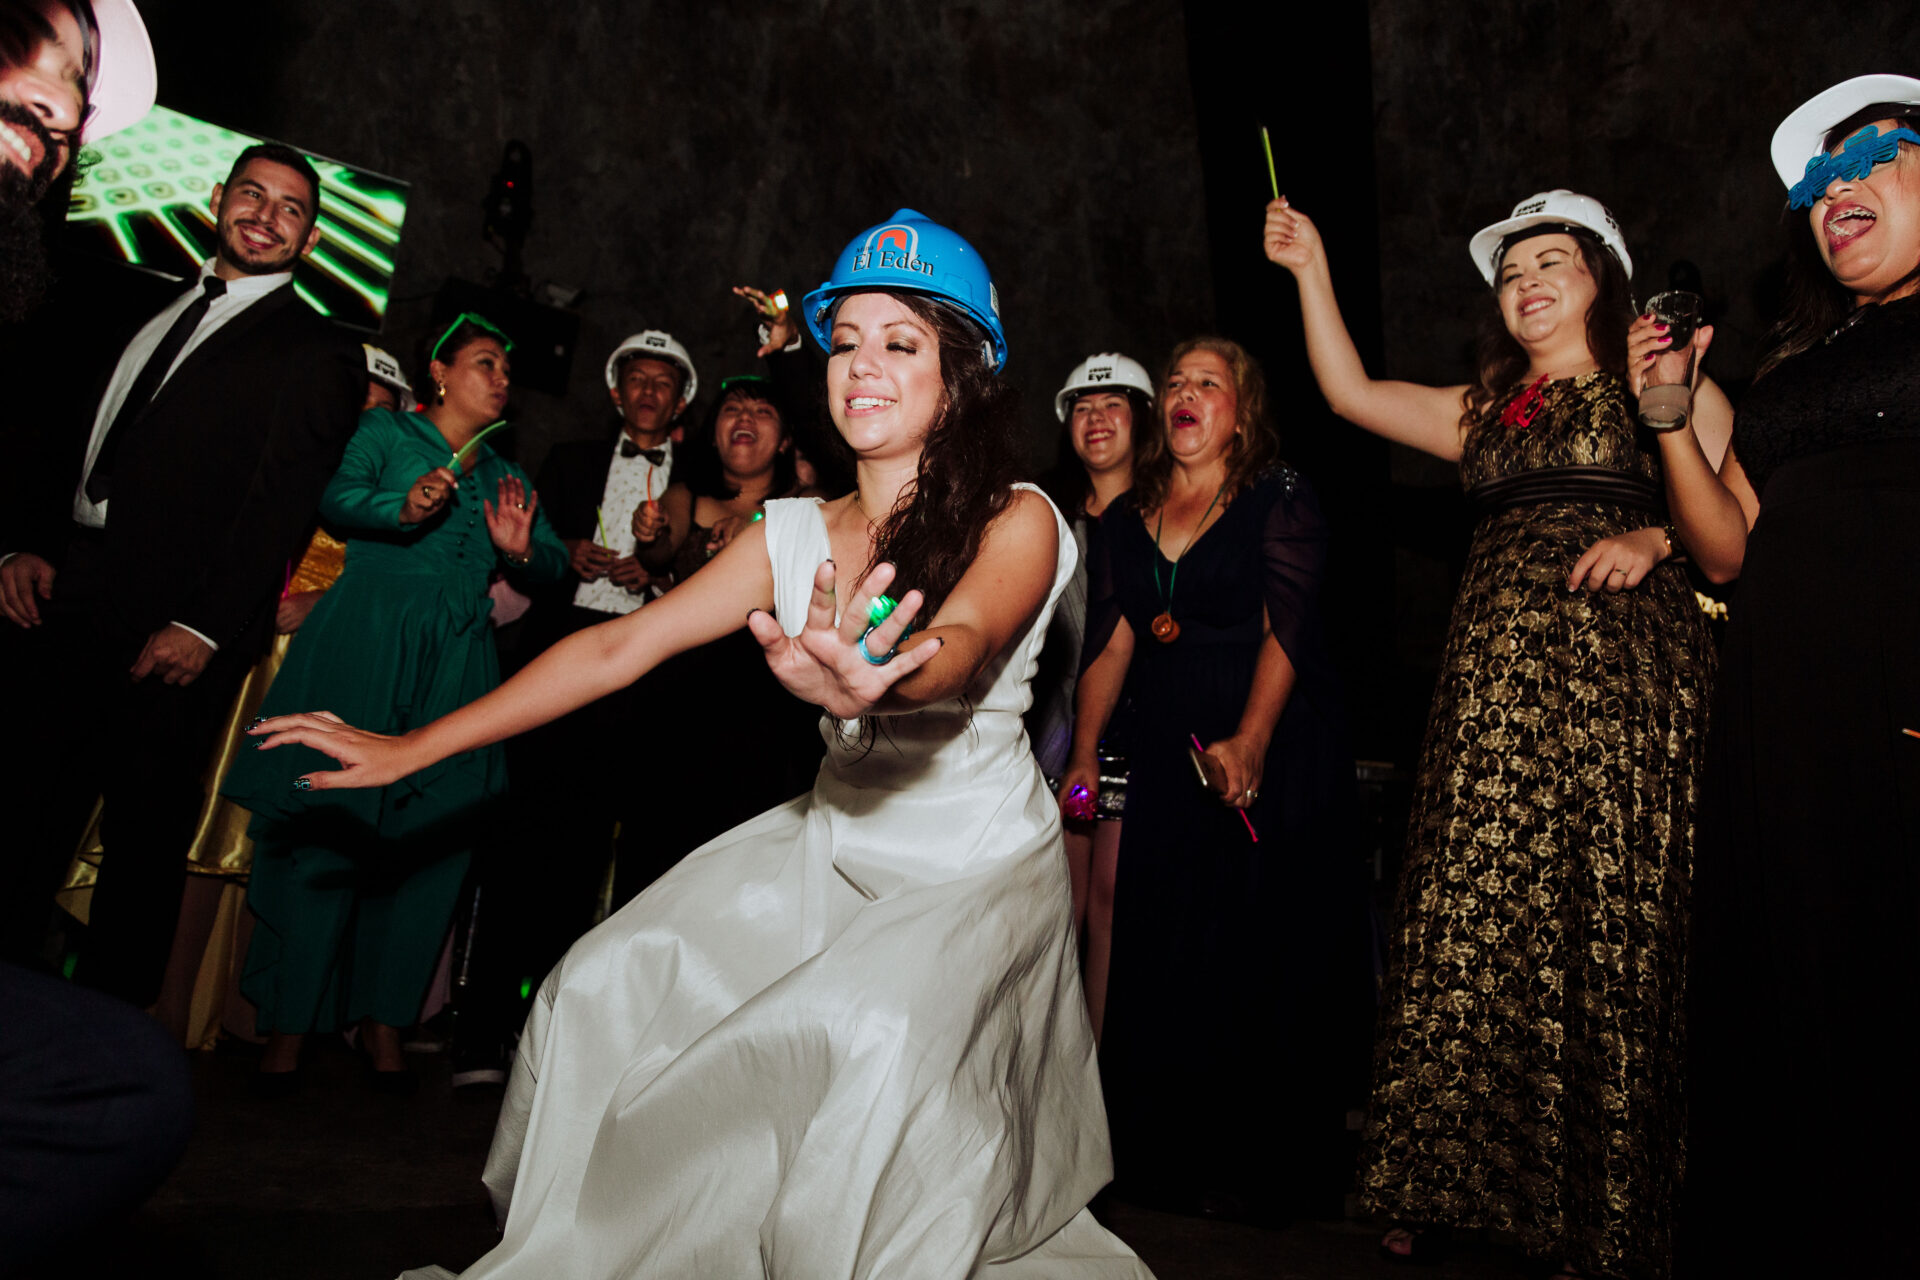 javier_noriega_fotografo_bodas_la_mina_club_zacatecas_wedding_photographer34